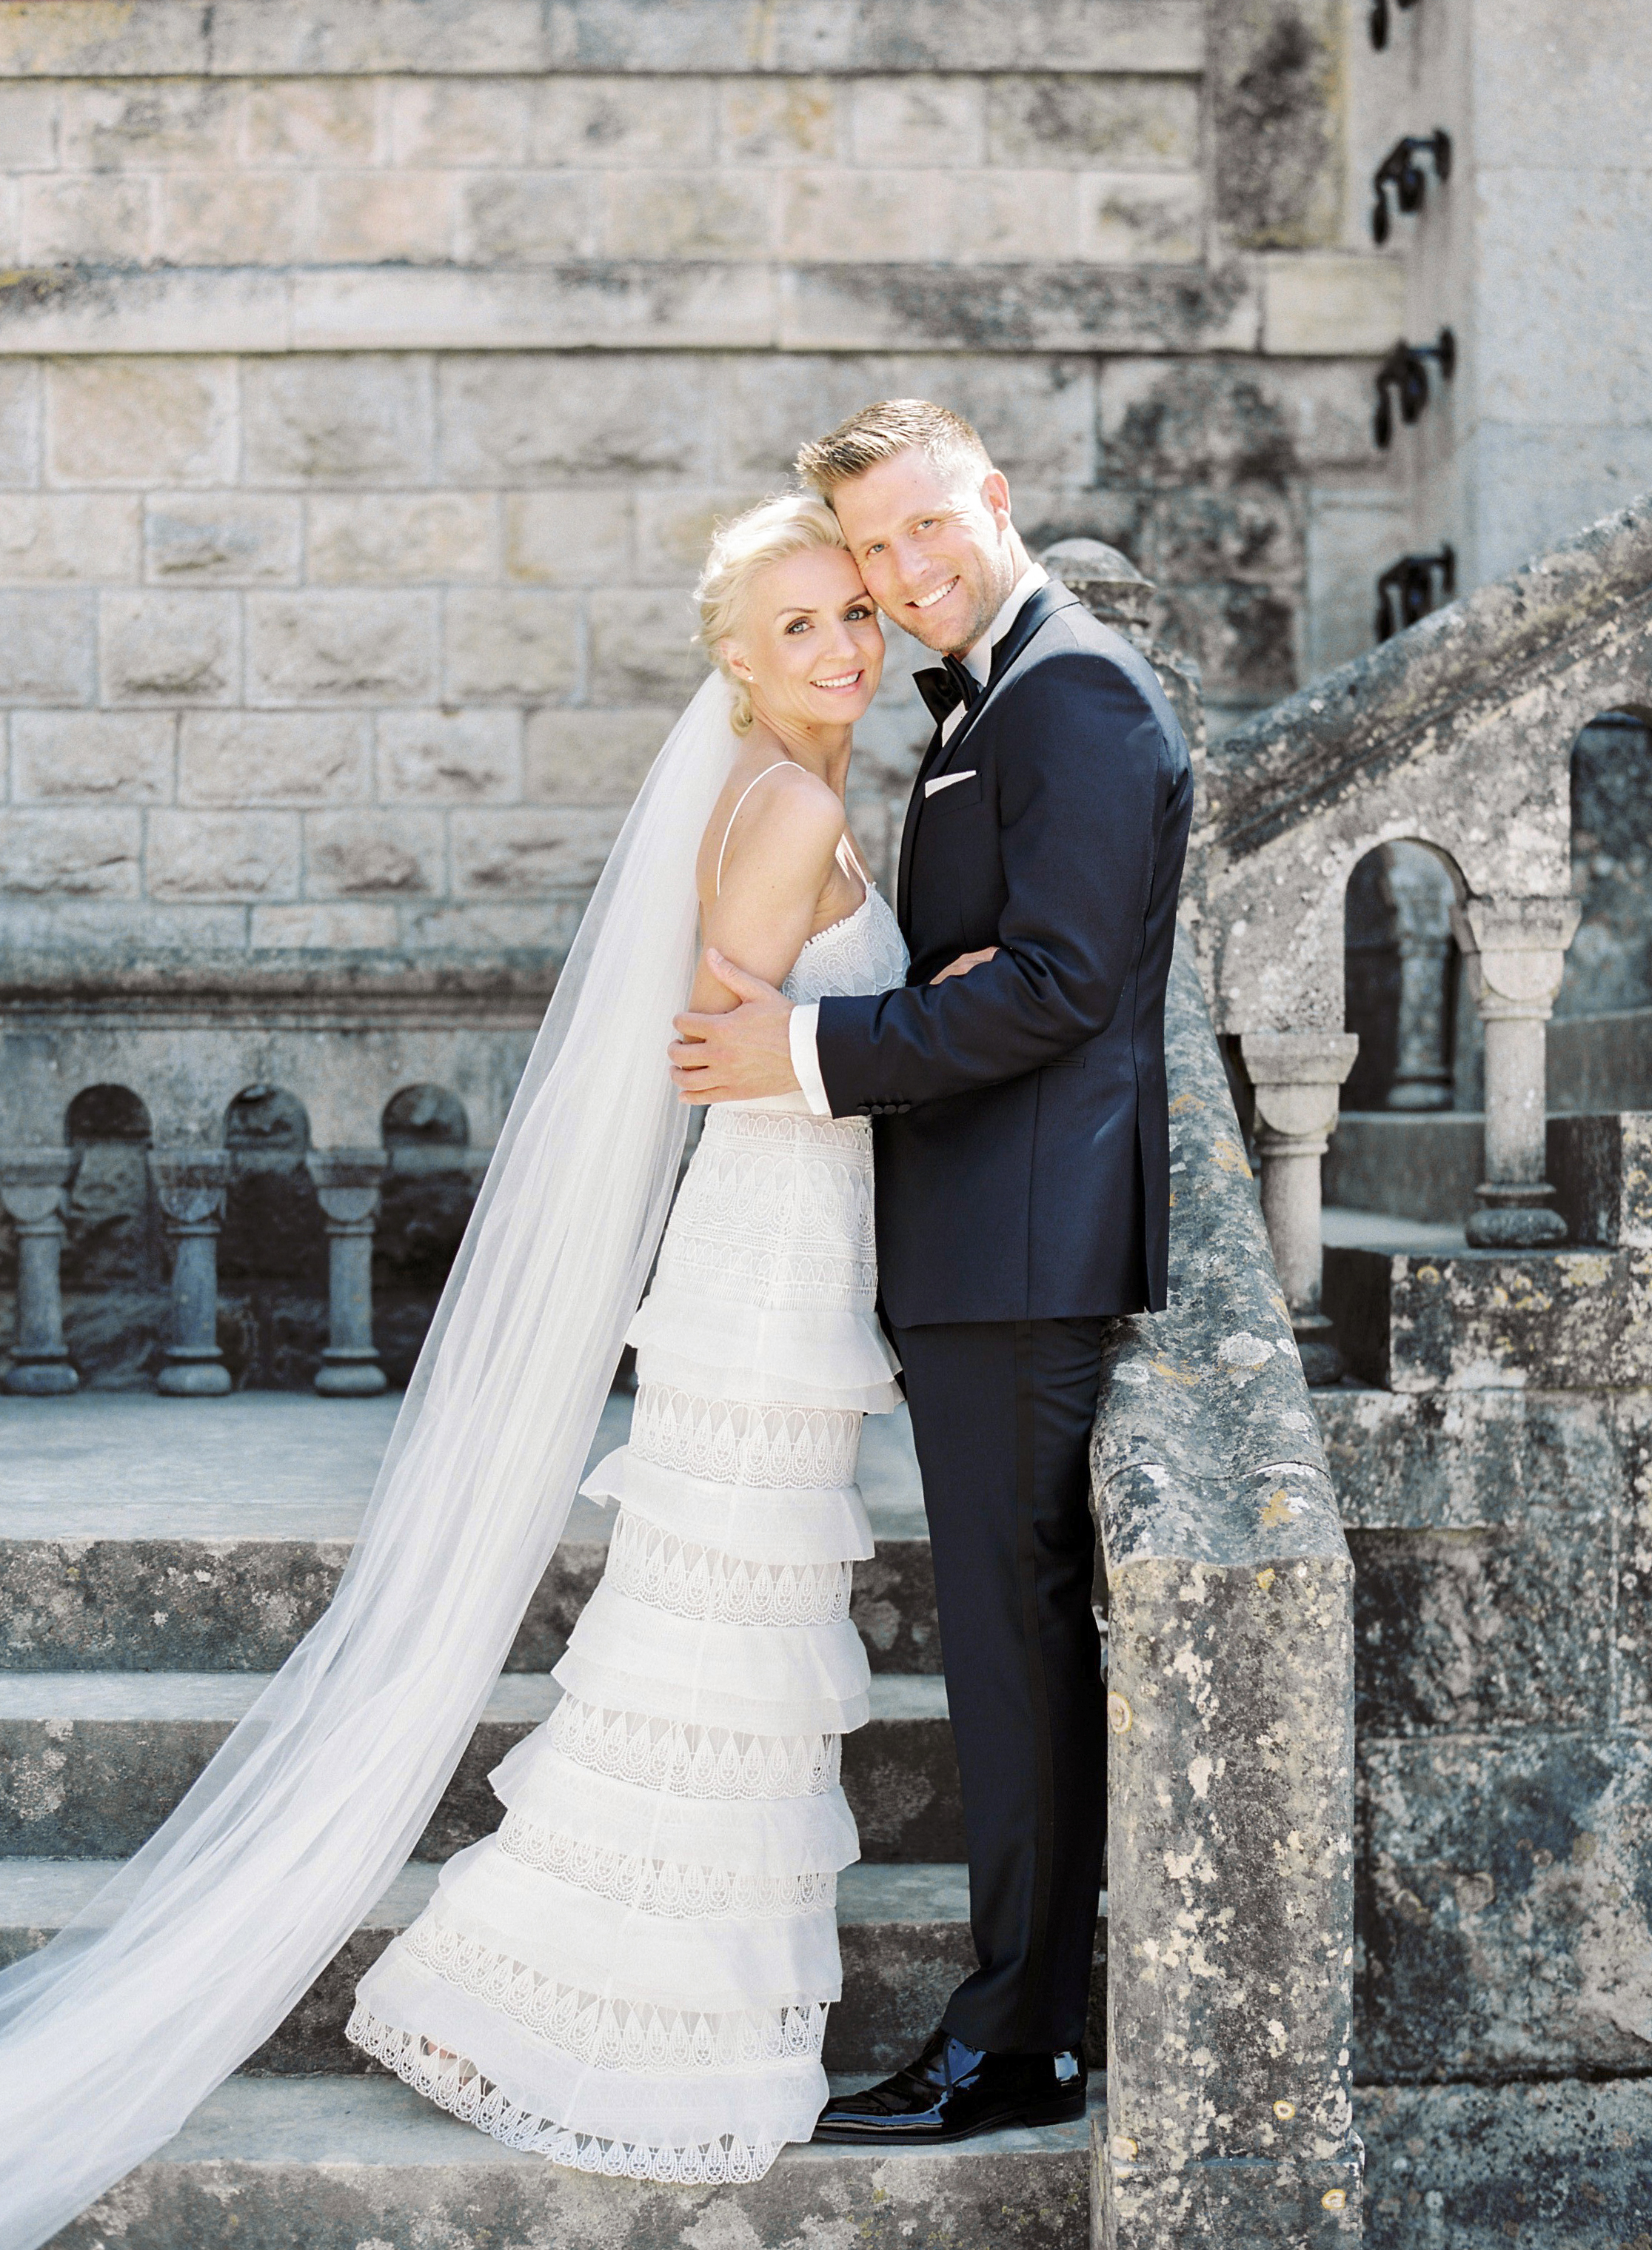 Nastia_Vesna_Photography_Wedding_Portugal_40.jpg